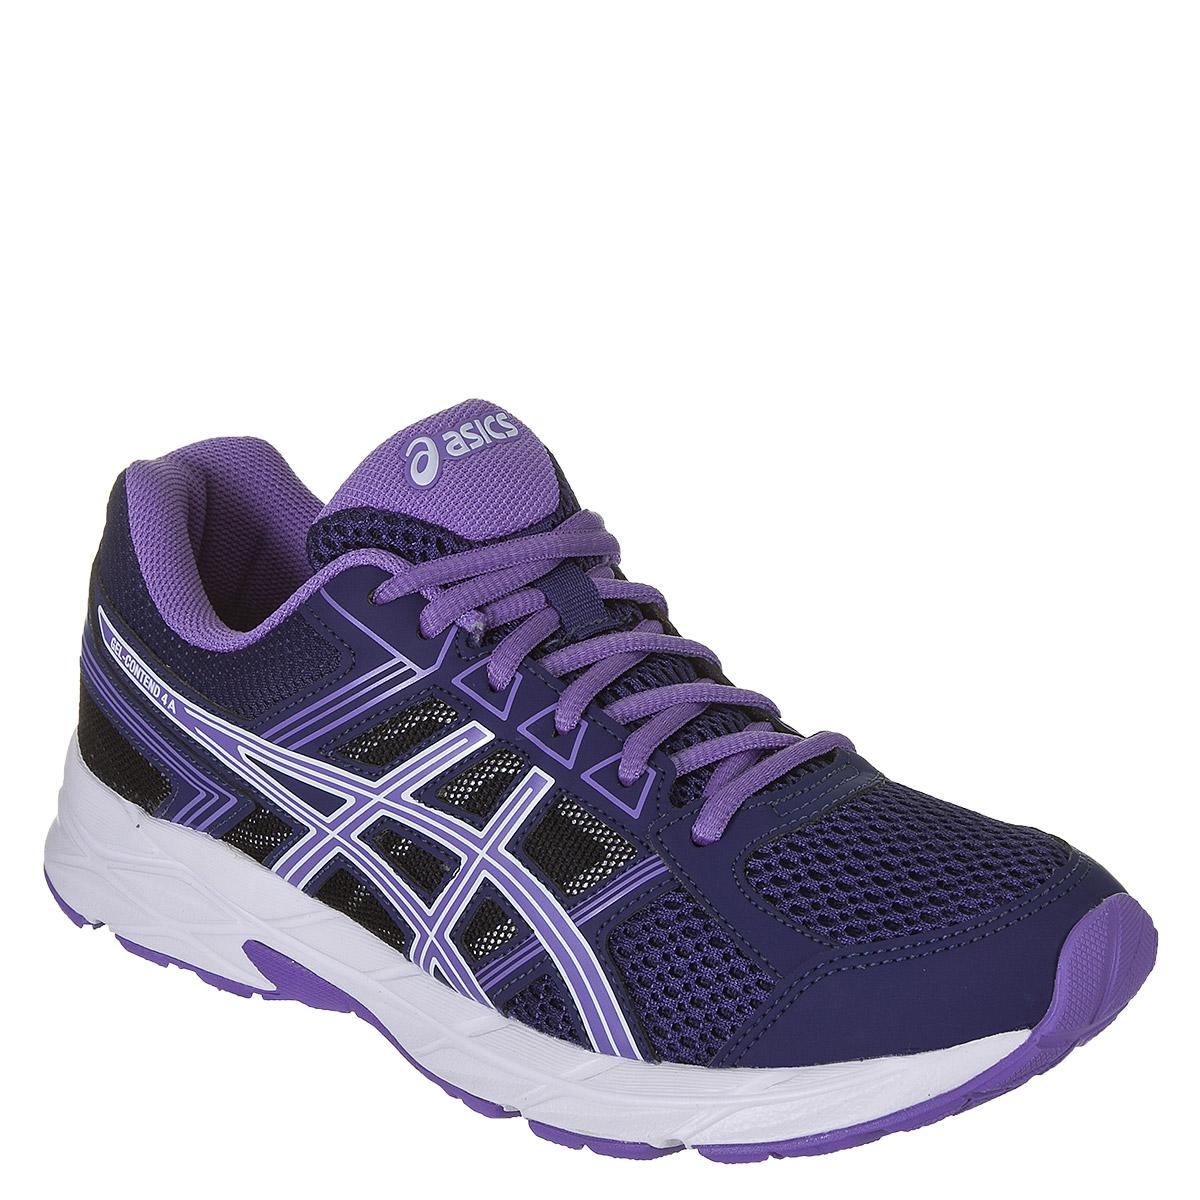 Tênis Asics Gel Contend 4 Feminino - Azul/Púrpura